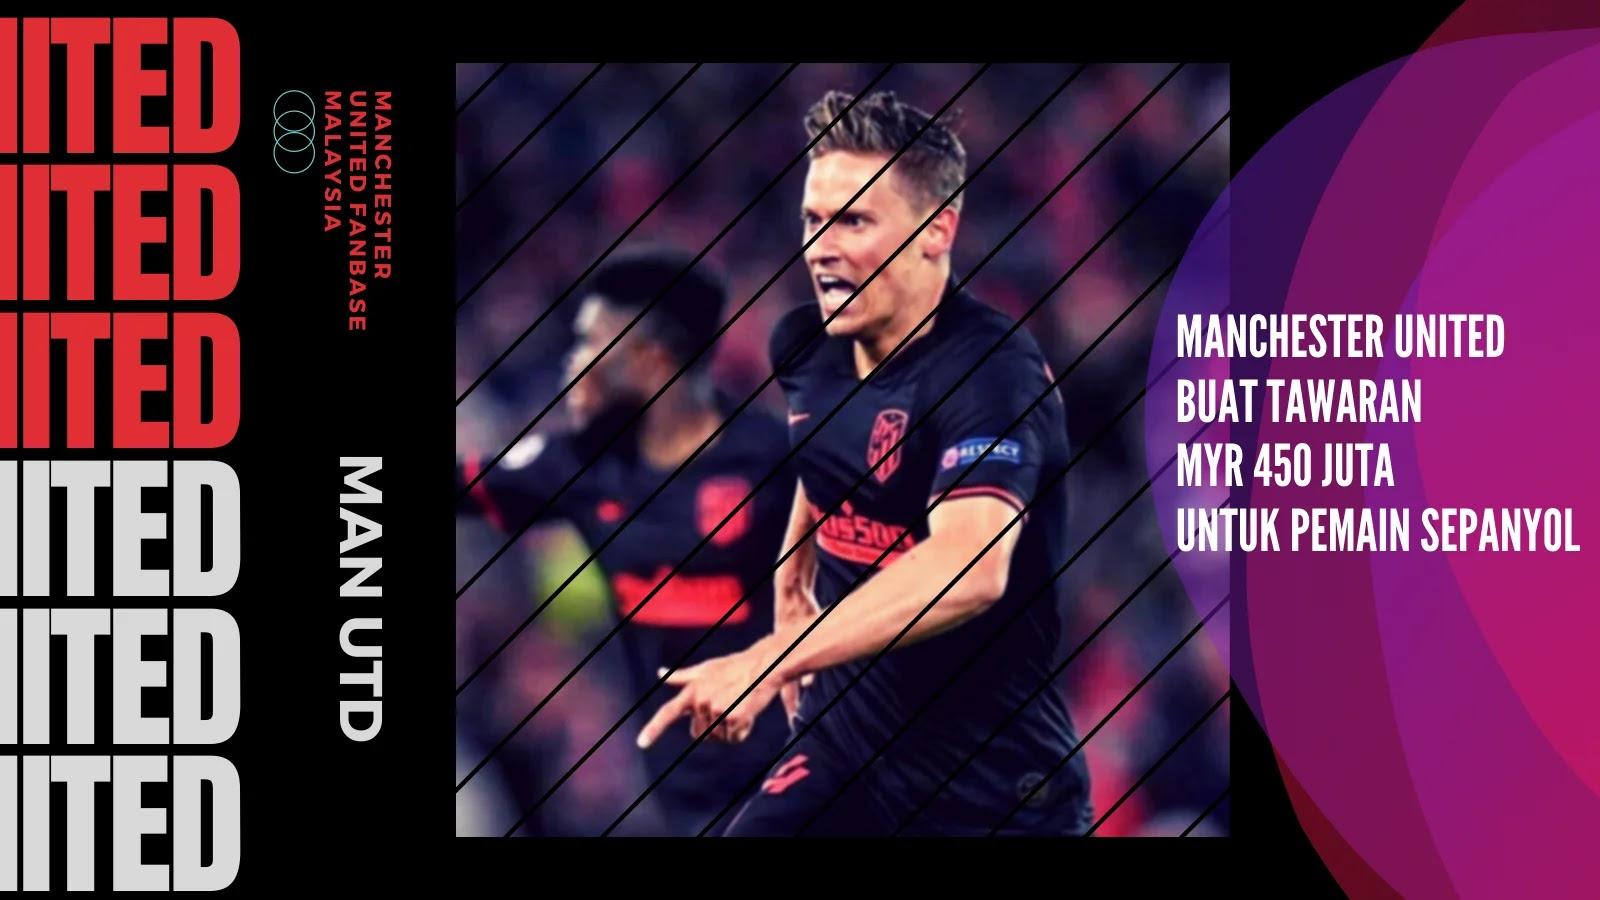 Manchester United Buat Tawaran MYR 450 juta untuk Marcos Llorente